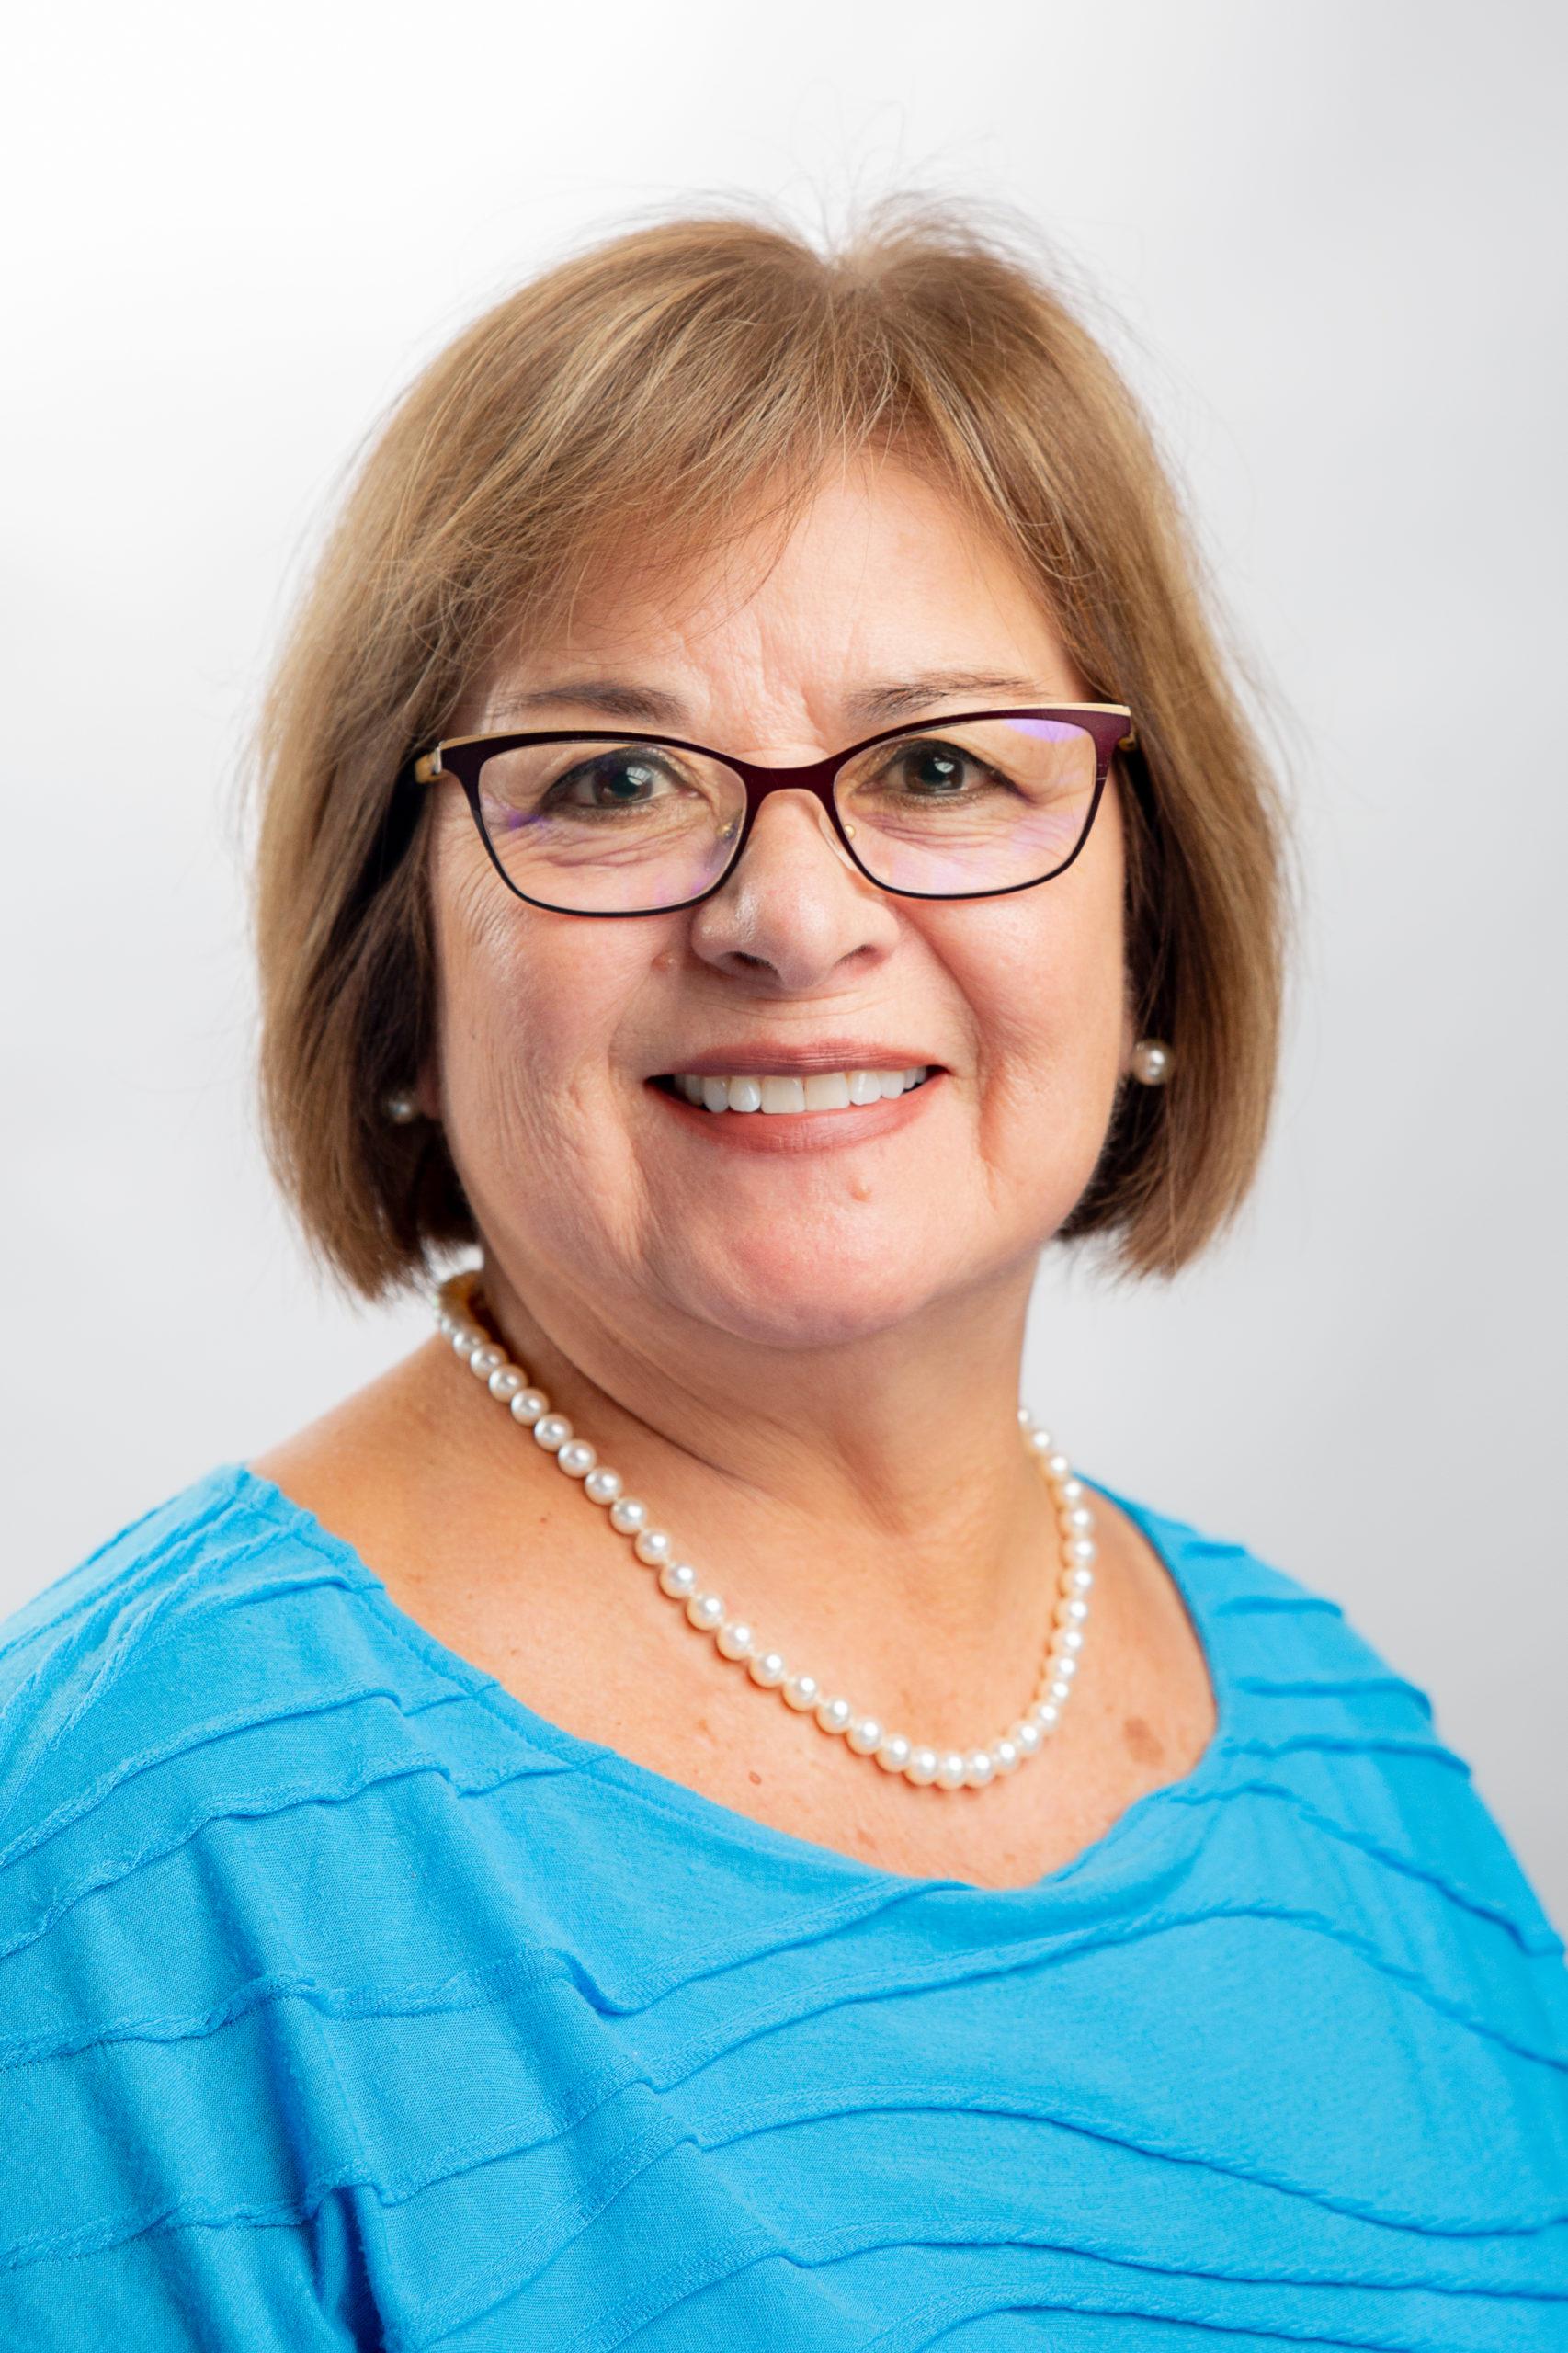 Lori Cravens